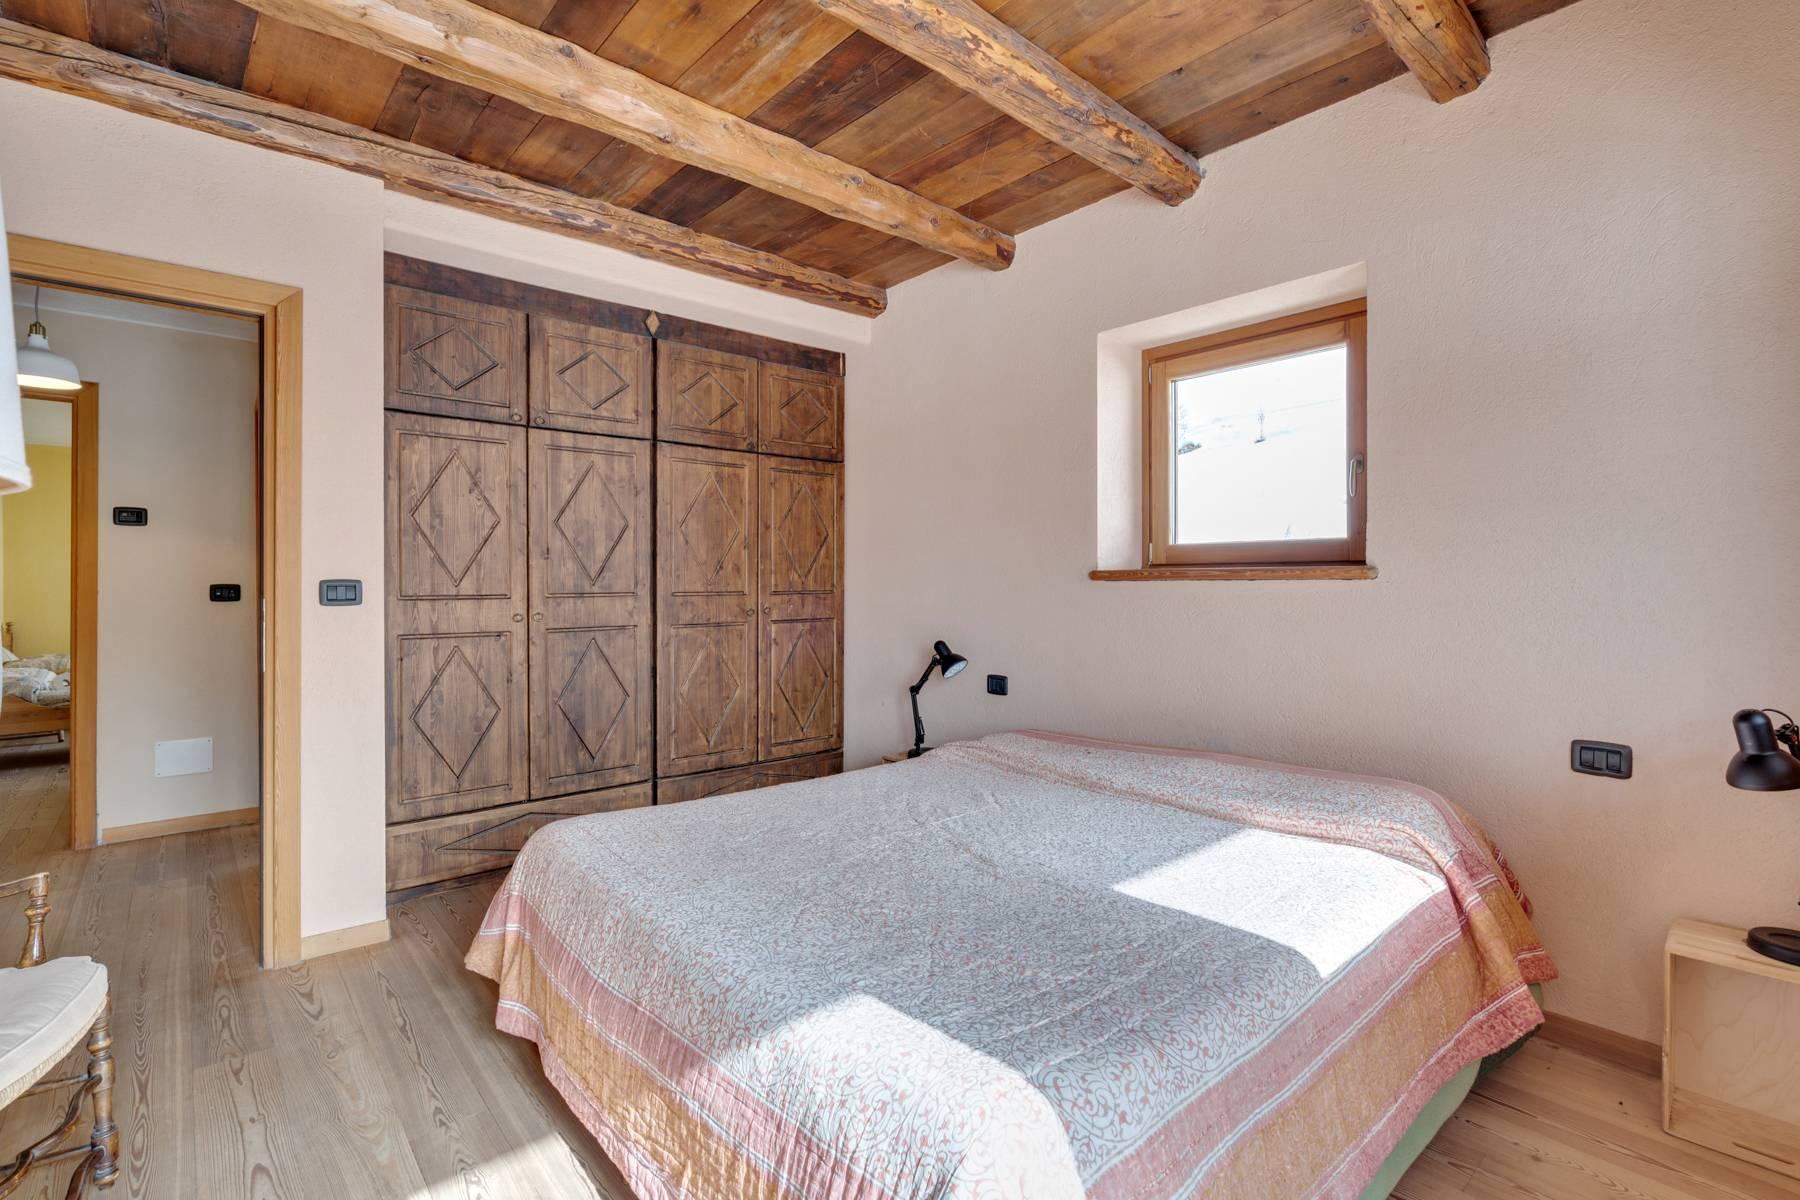 Villa in Vendita a Cogne: 5 locali, 384 mq - Foto 20